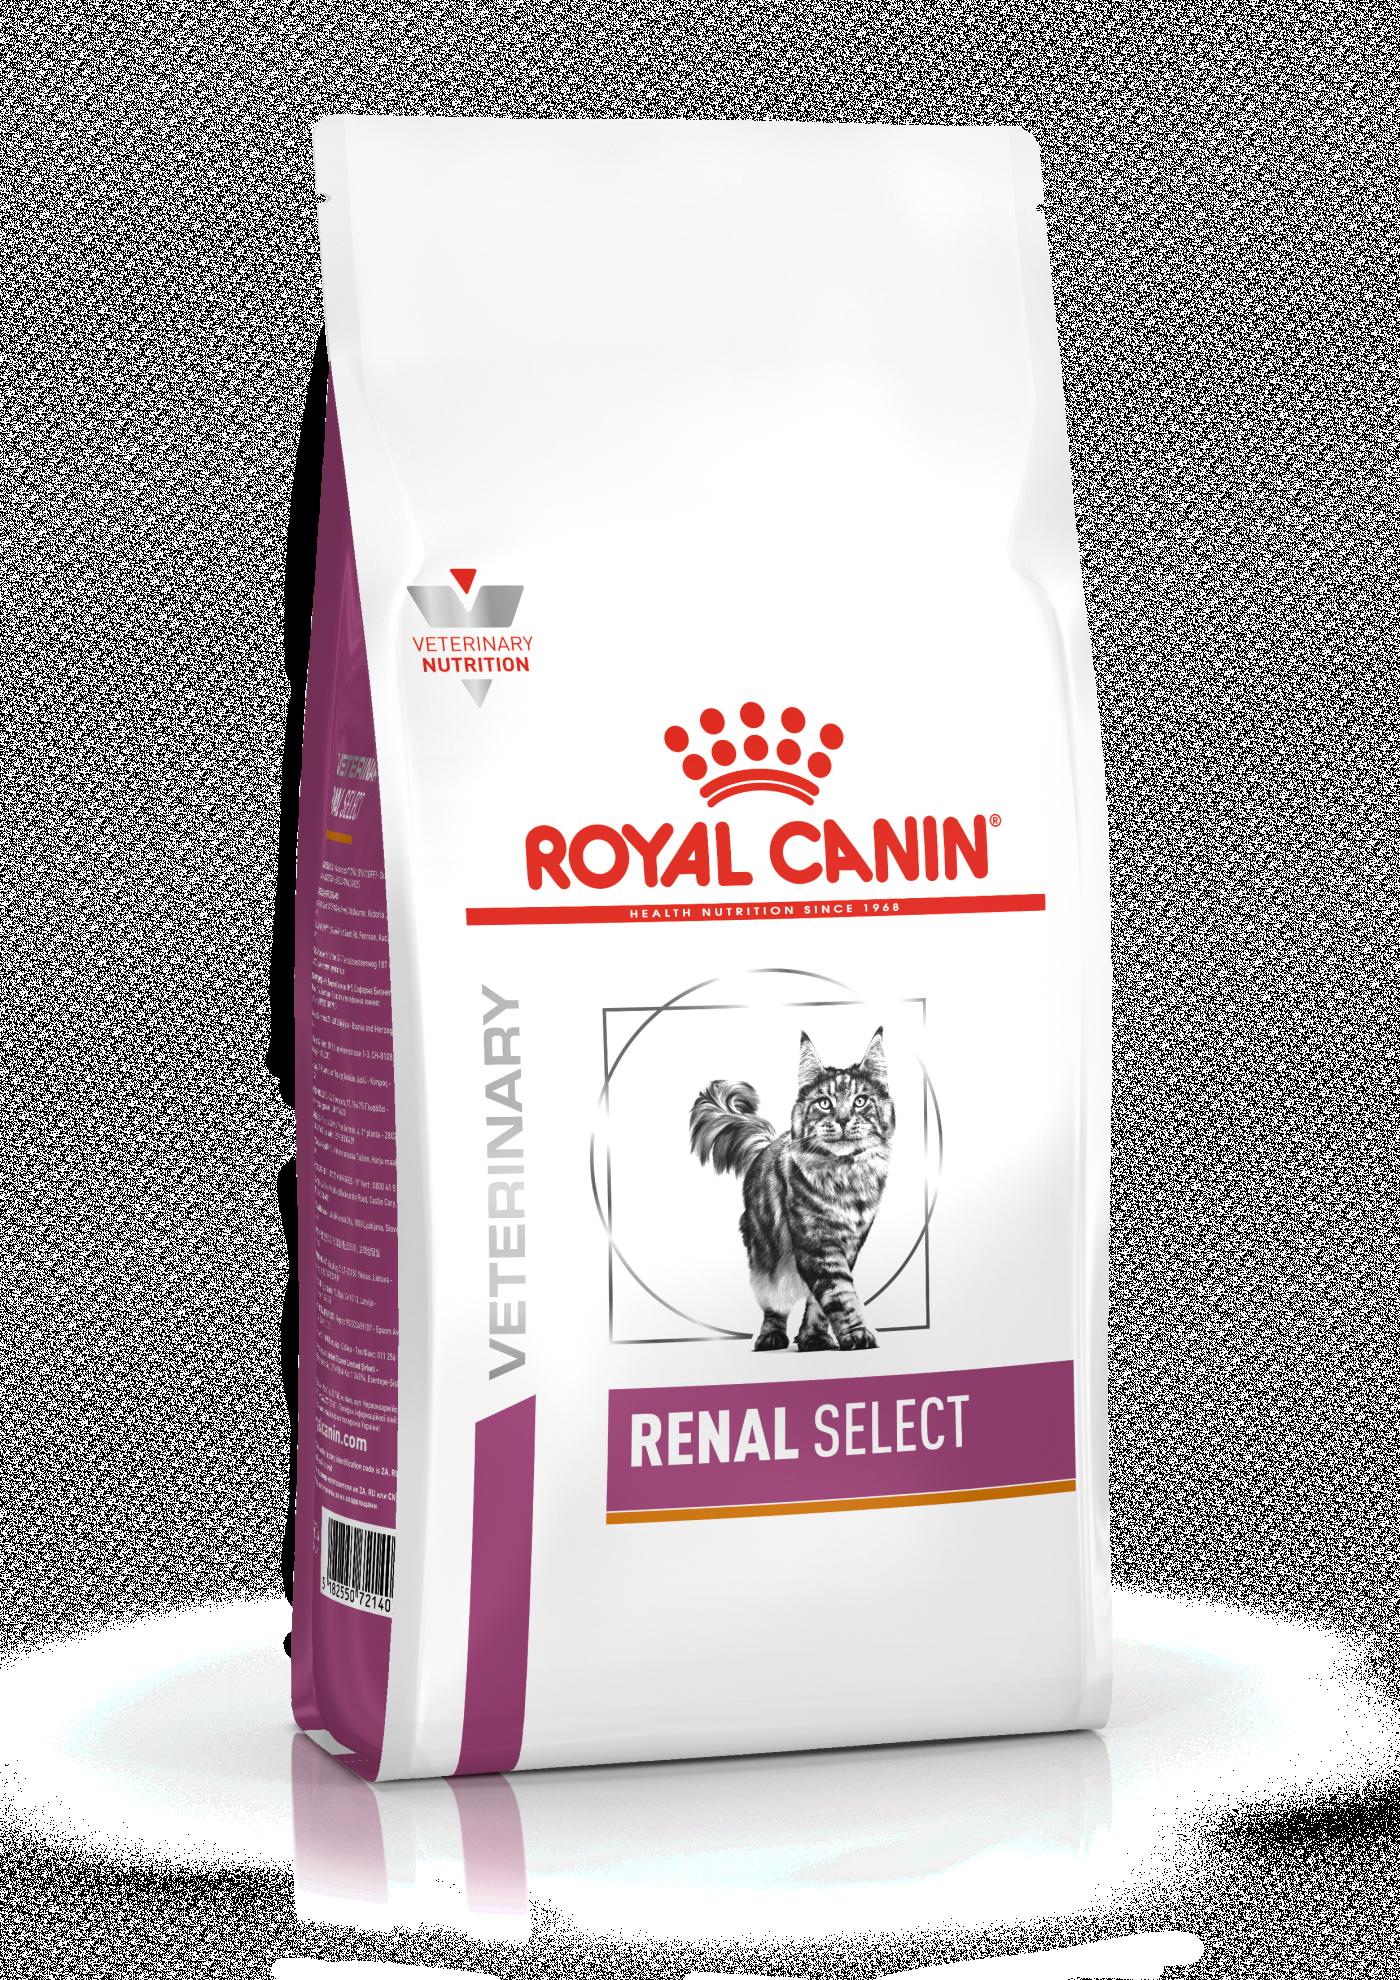 Renal   Select product image